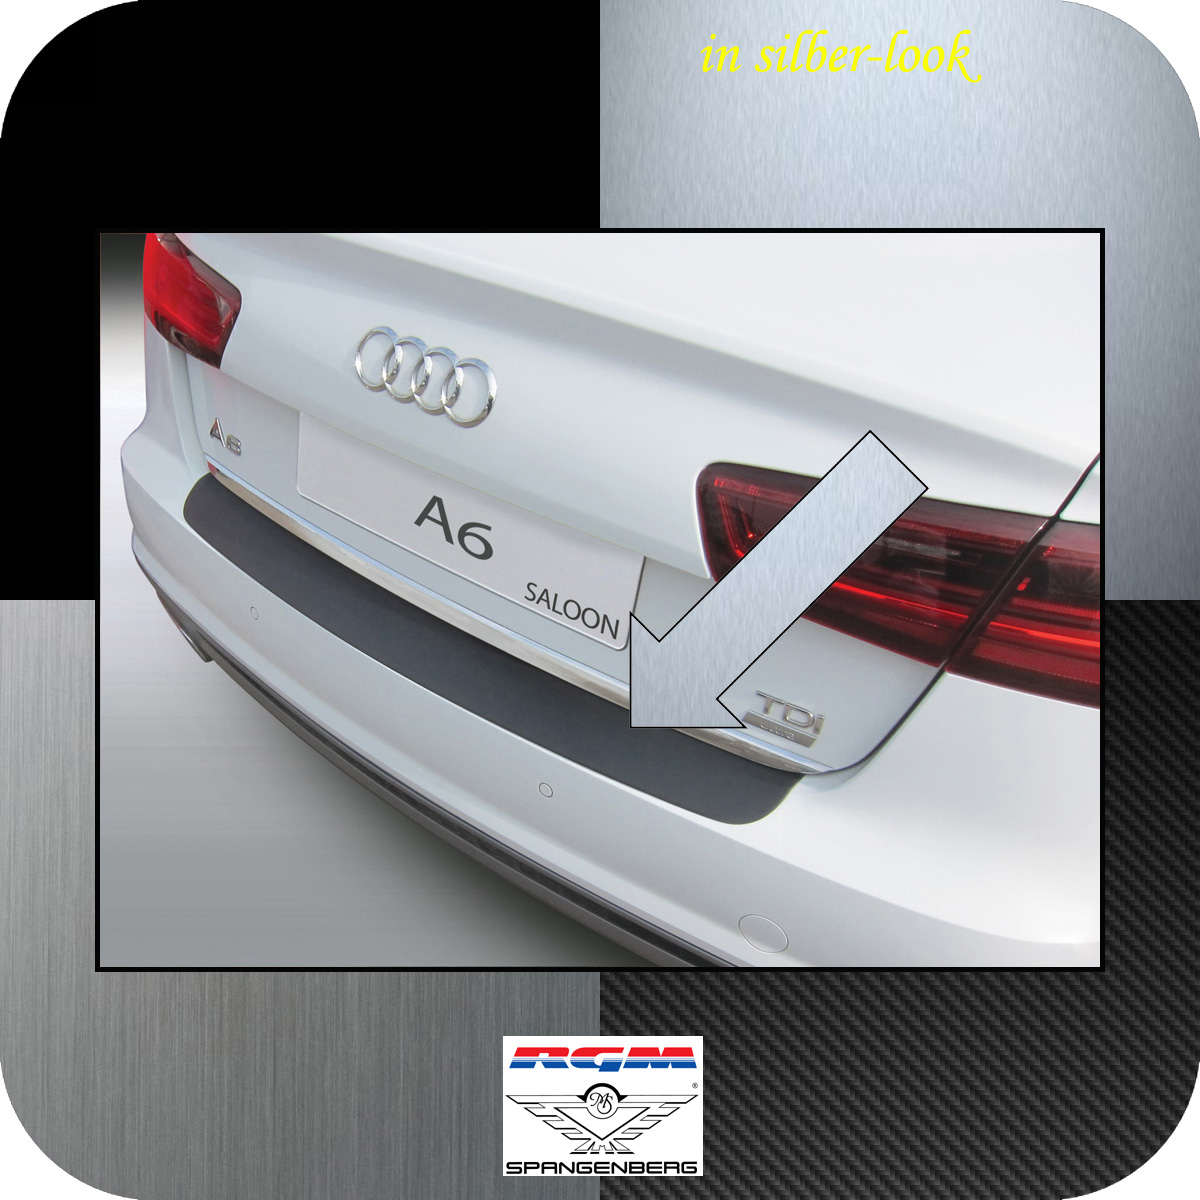 Ladekantenschutz Silber-Look Audi A6 Limousine C7 Baujahre 1.2011-5.2016 3506989